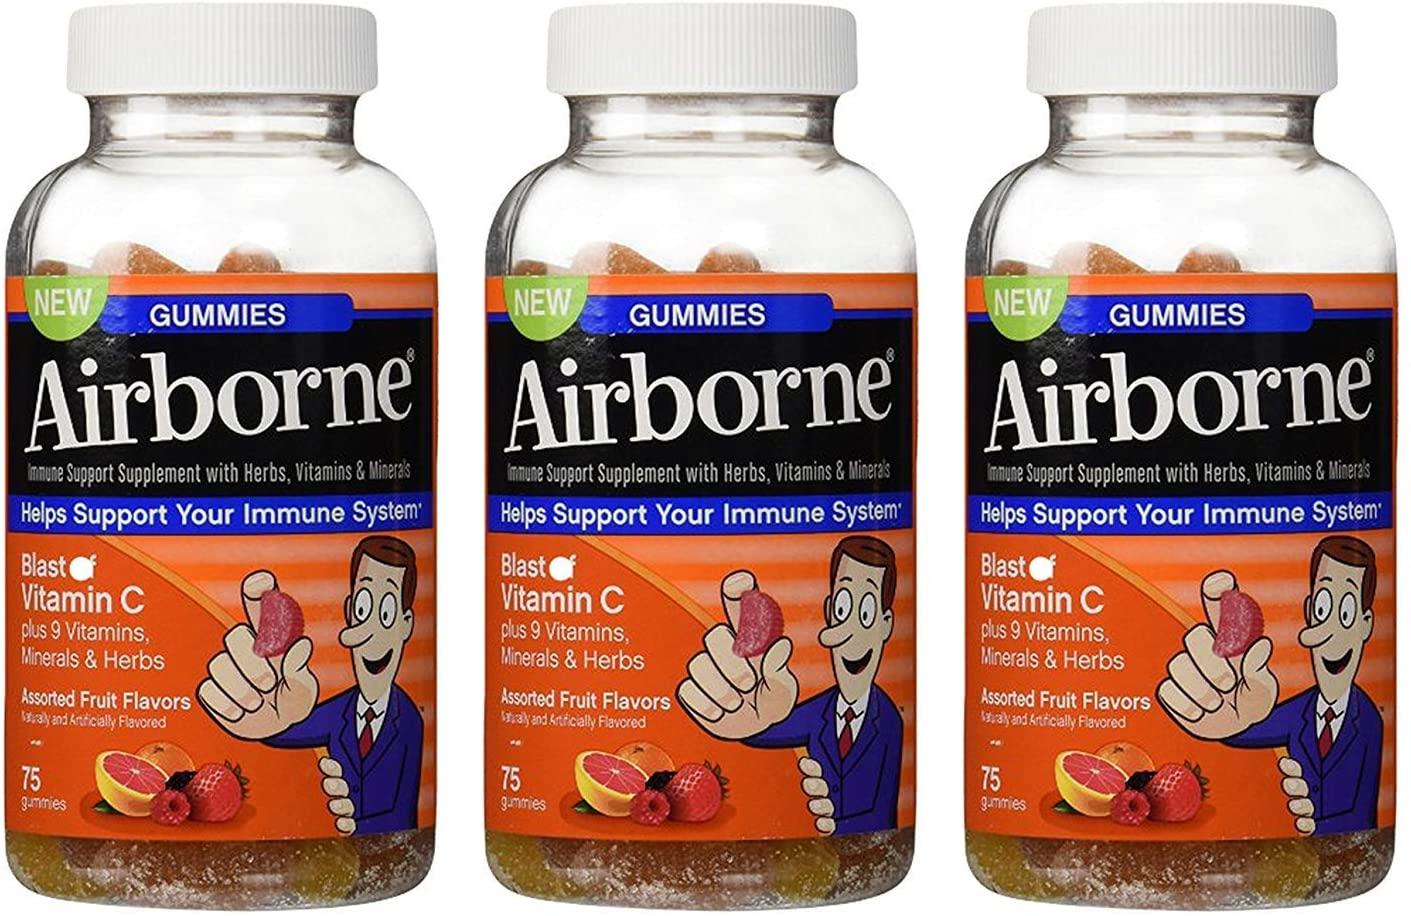 Airborne Gummies Blast of Vitamin C 75 Gummies(Pack of 3)